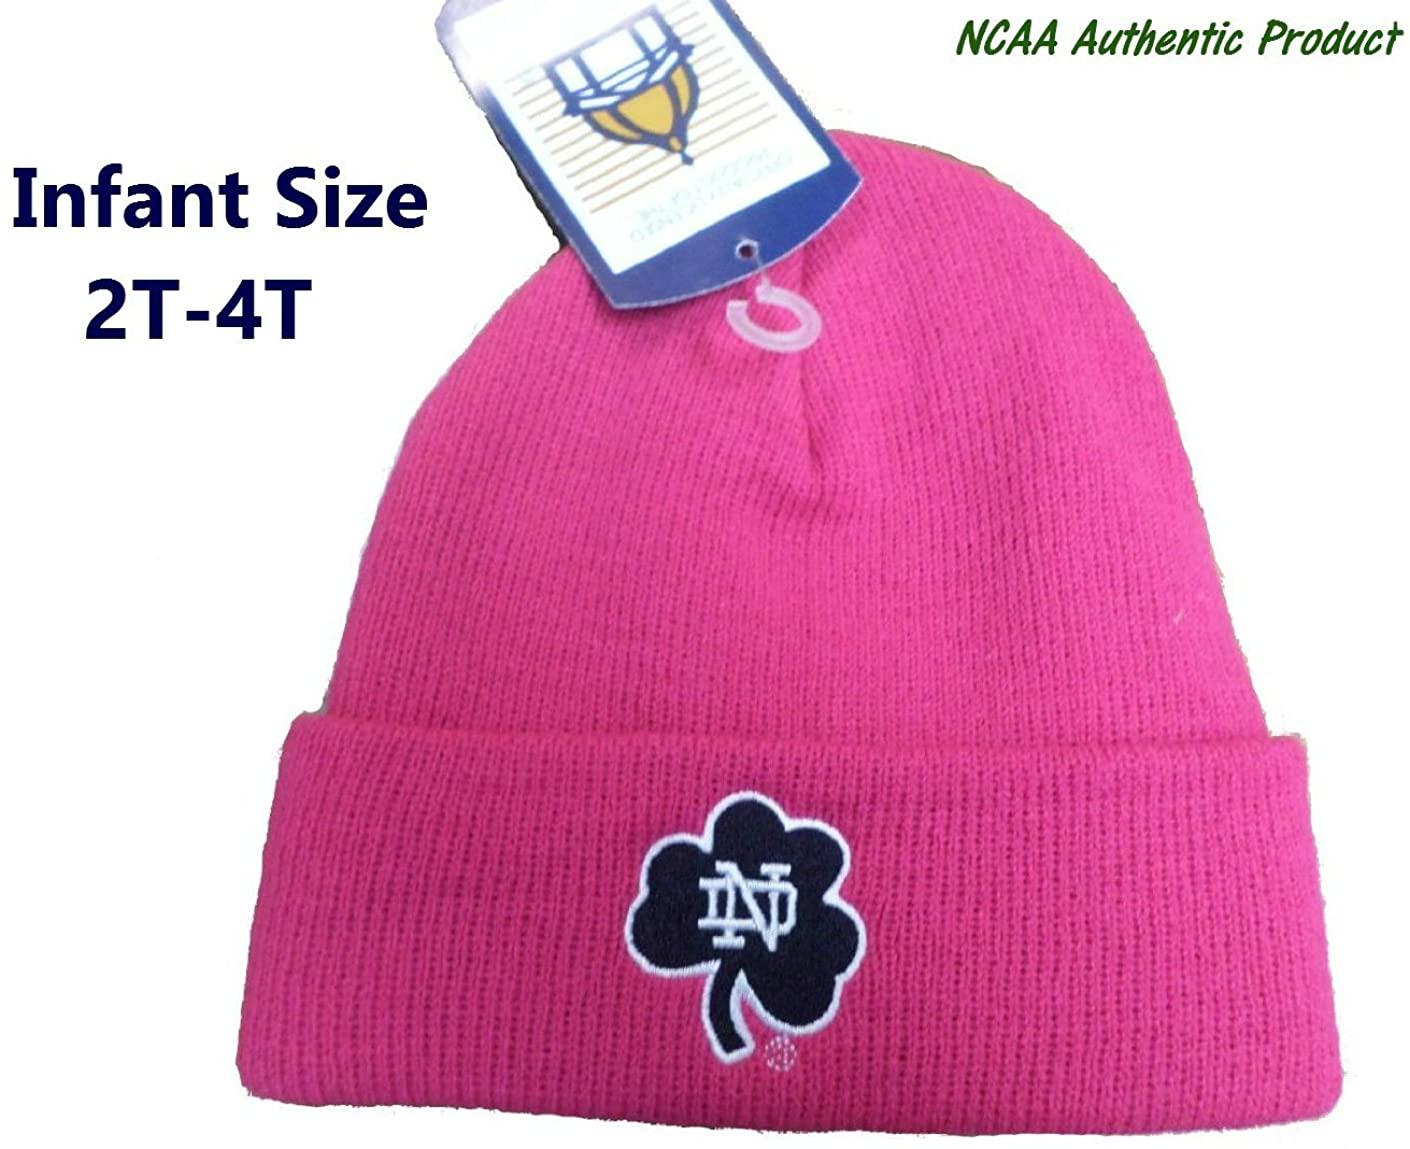 Notre Dame Fighting Irish Toddler (2T-4T) Knit Cuff Beanie Pink Hat Cap